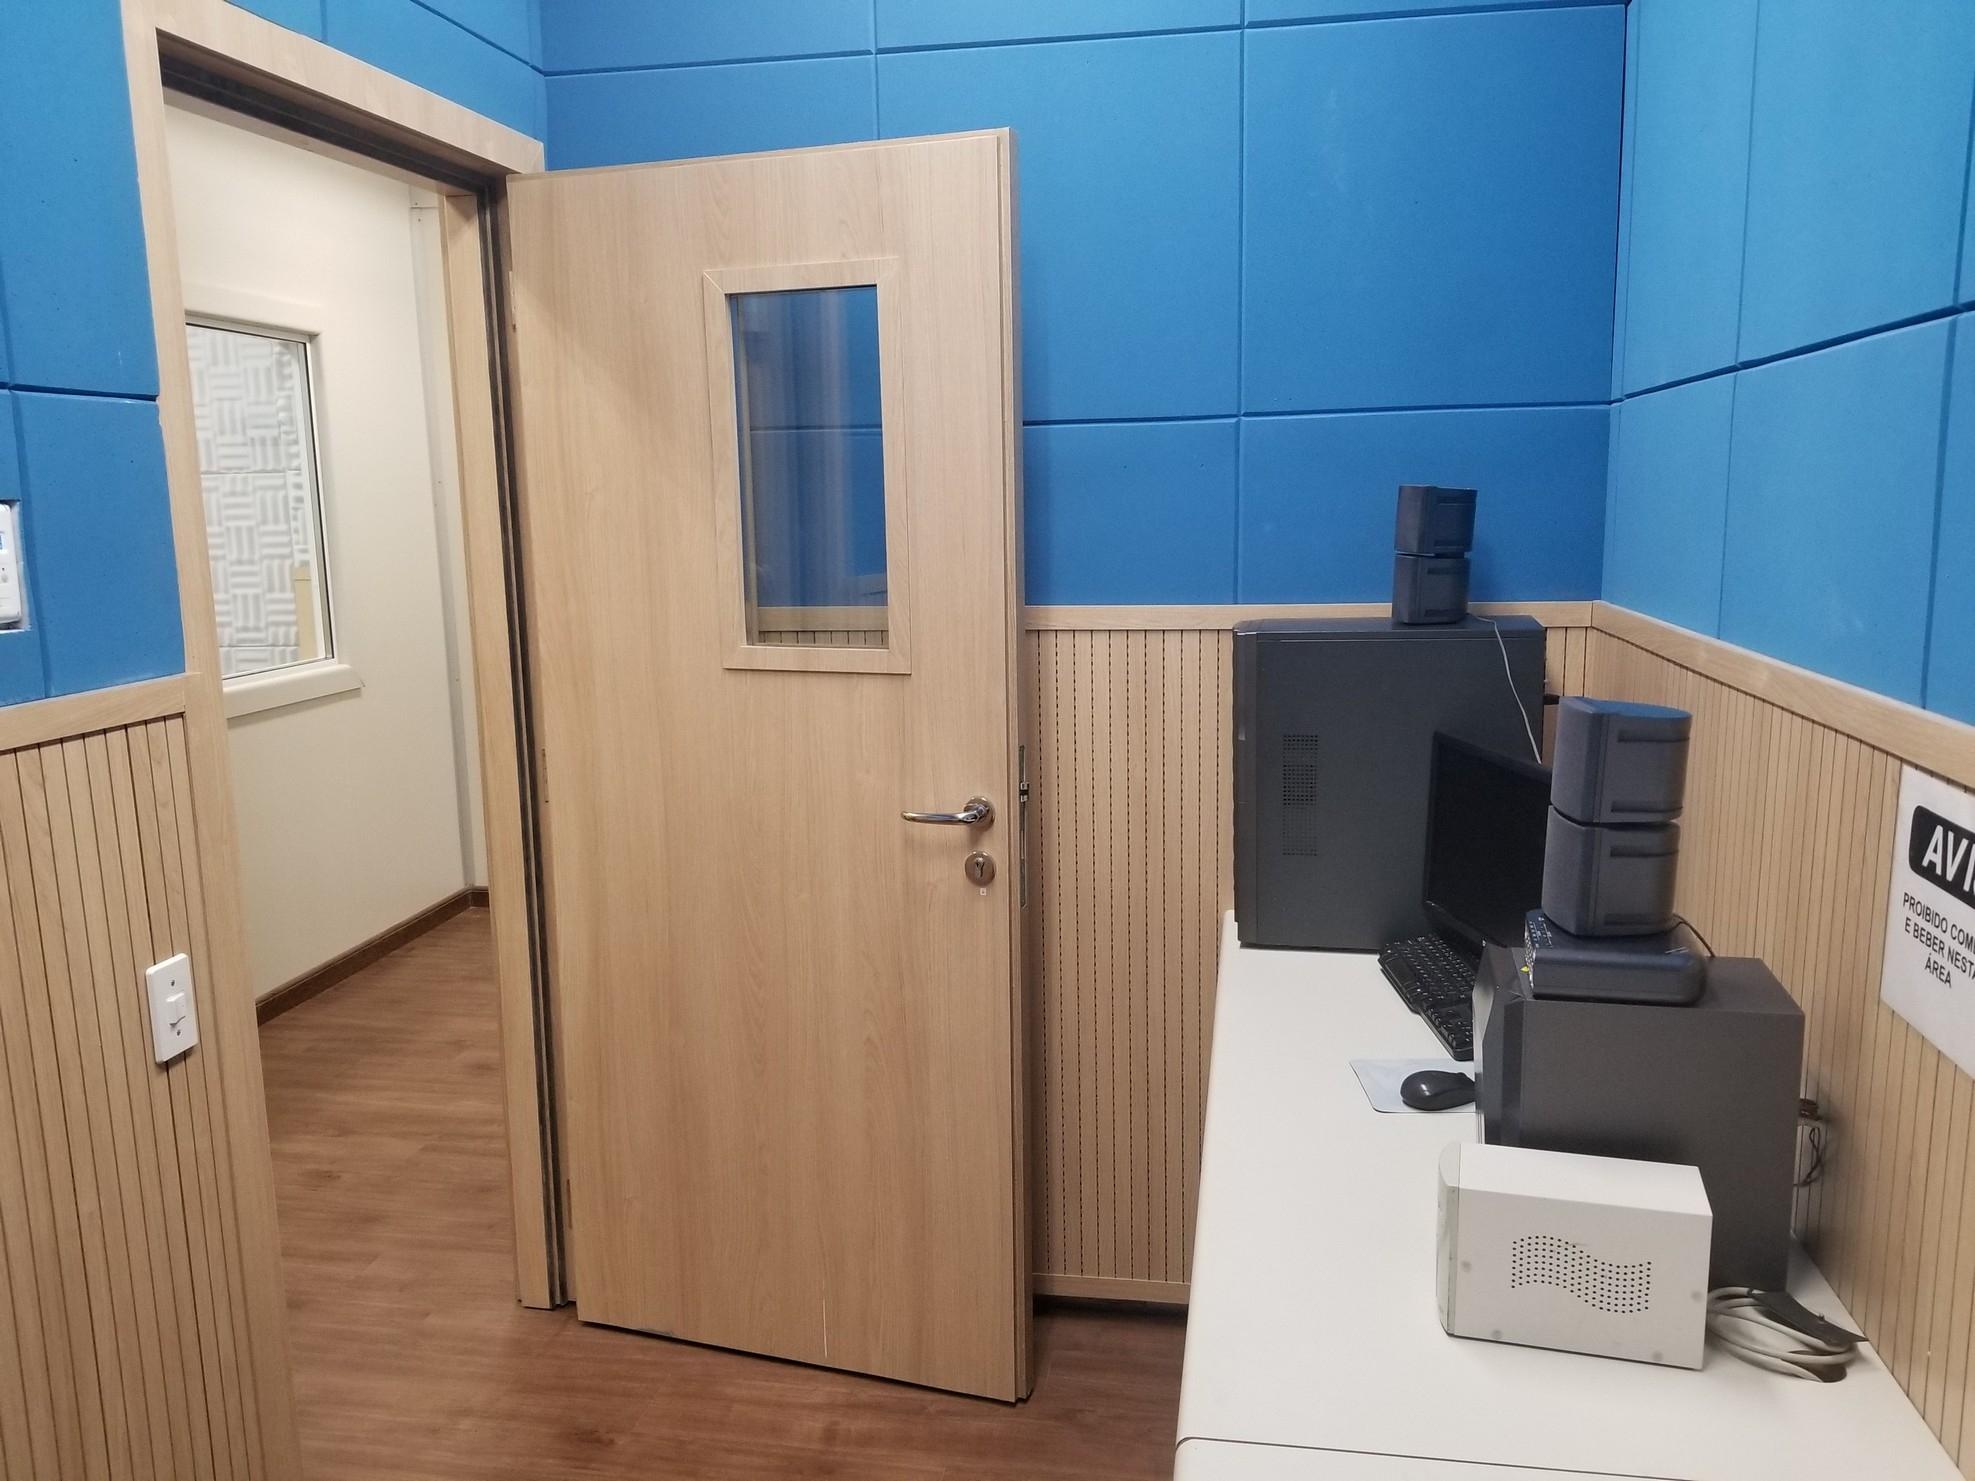 porta-acustica-de-madeira-idealacustica-banner1